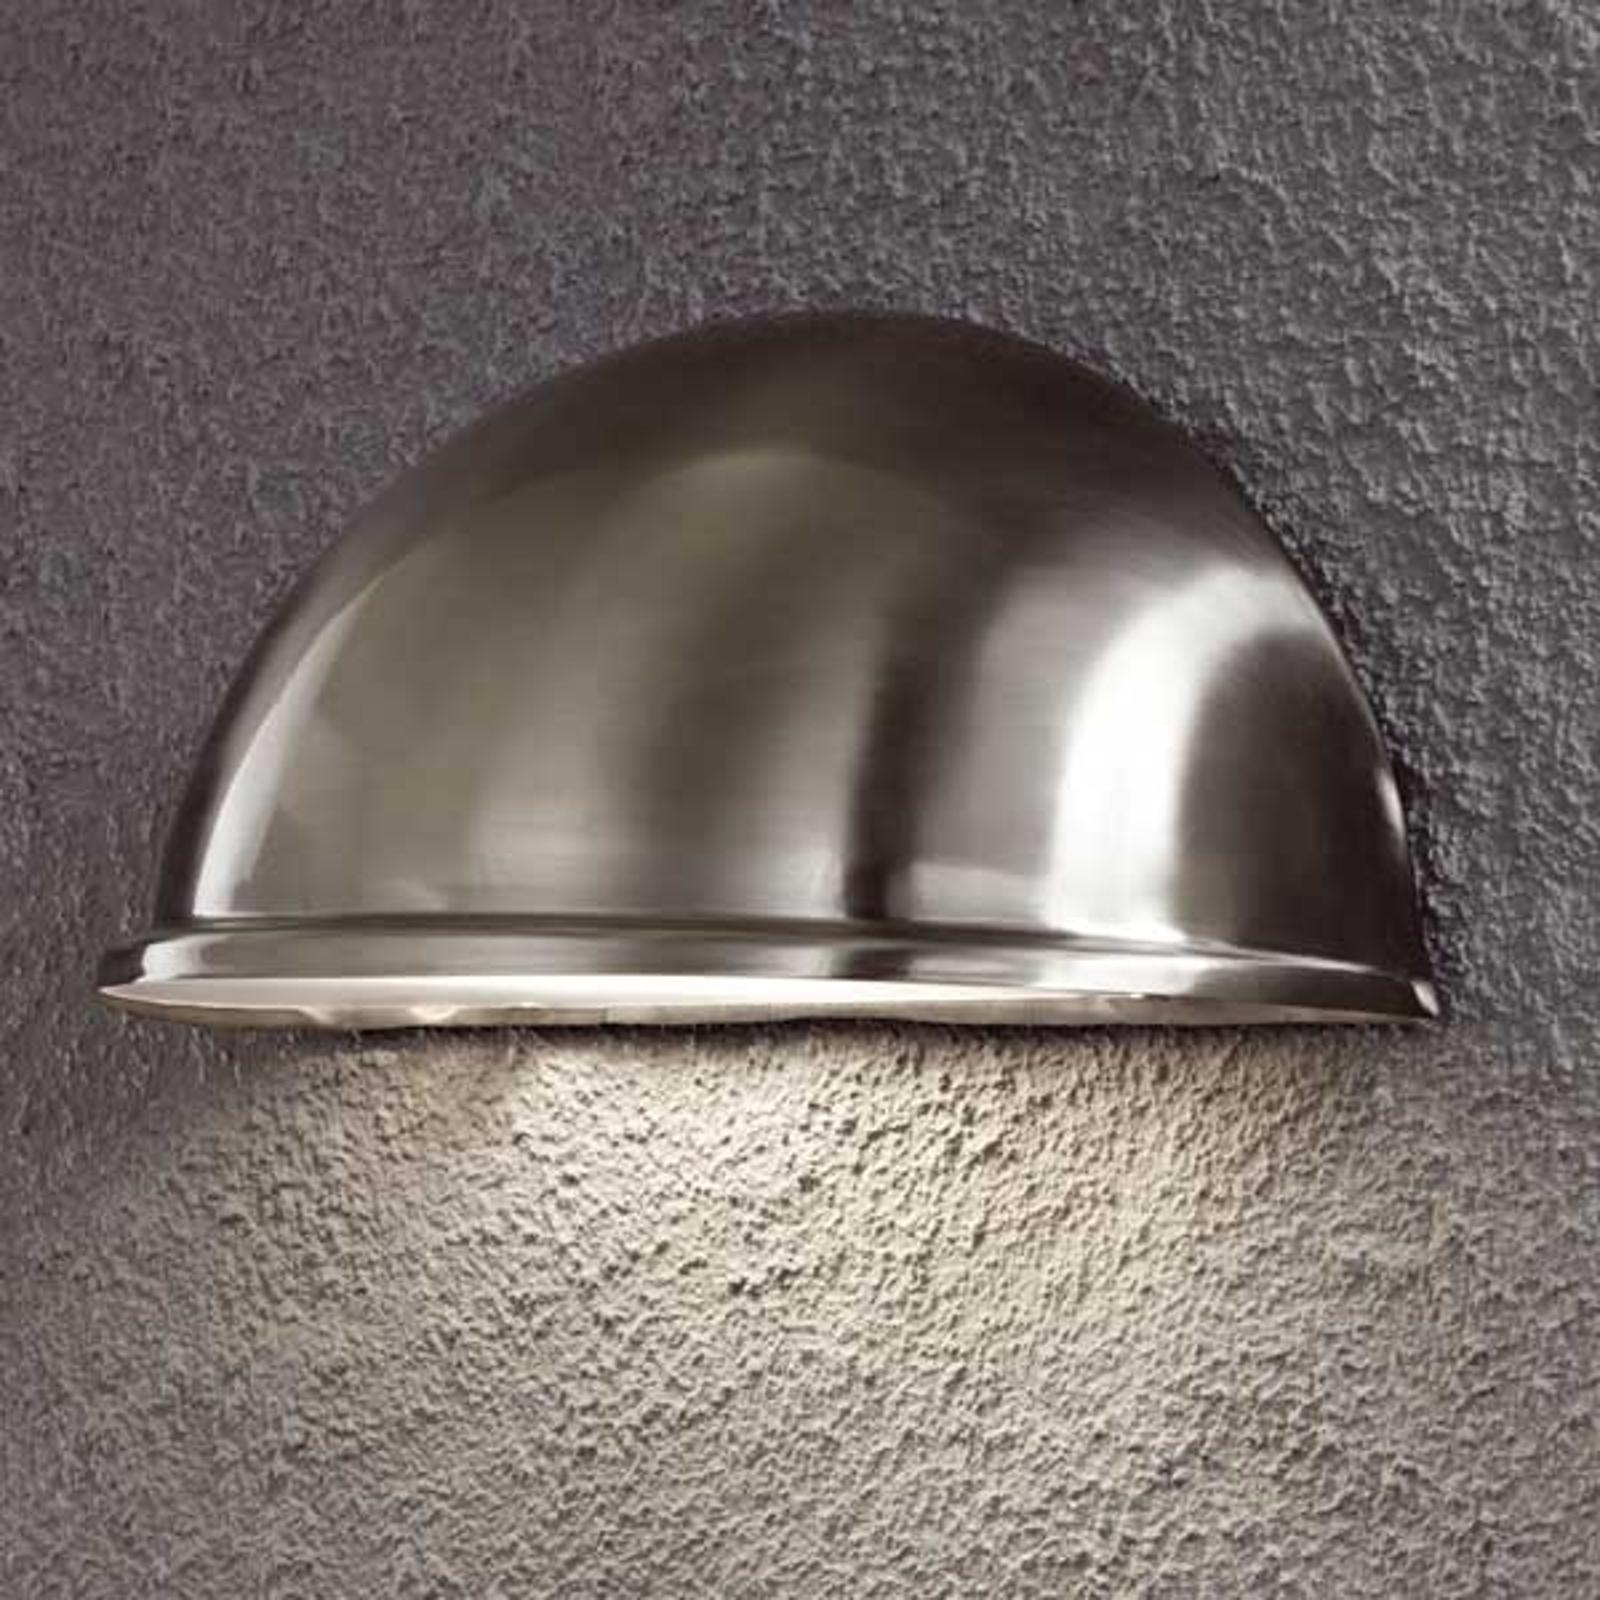 Solide buitenwandlamp TORINO E27, rvs